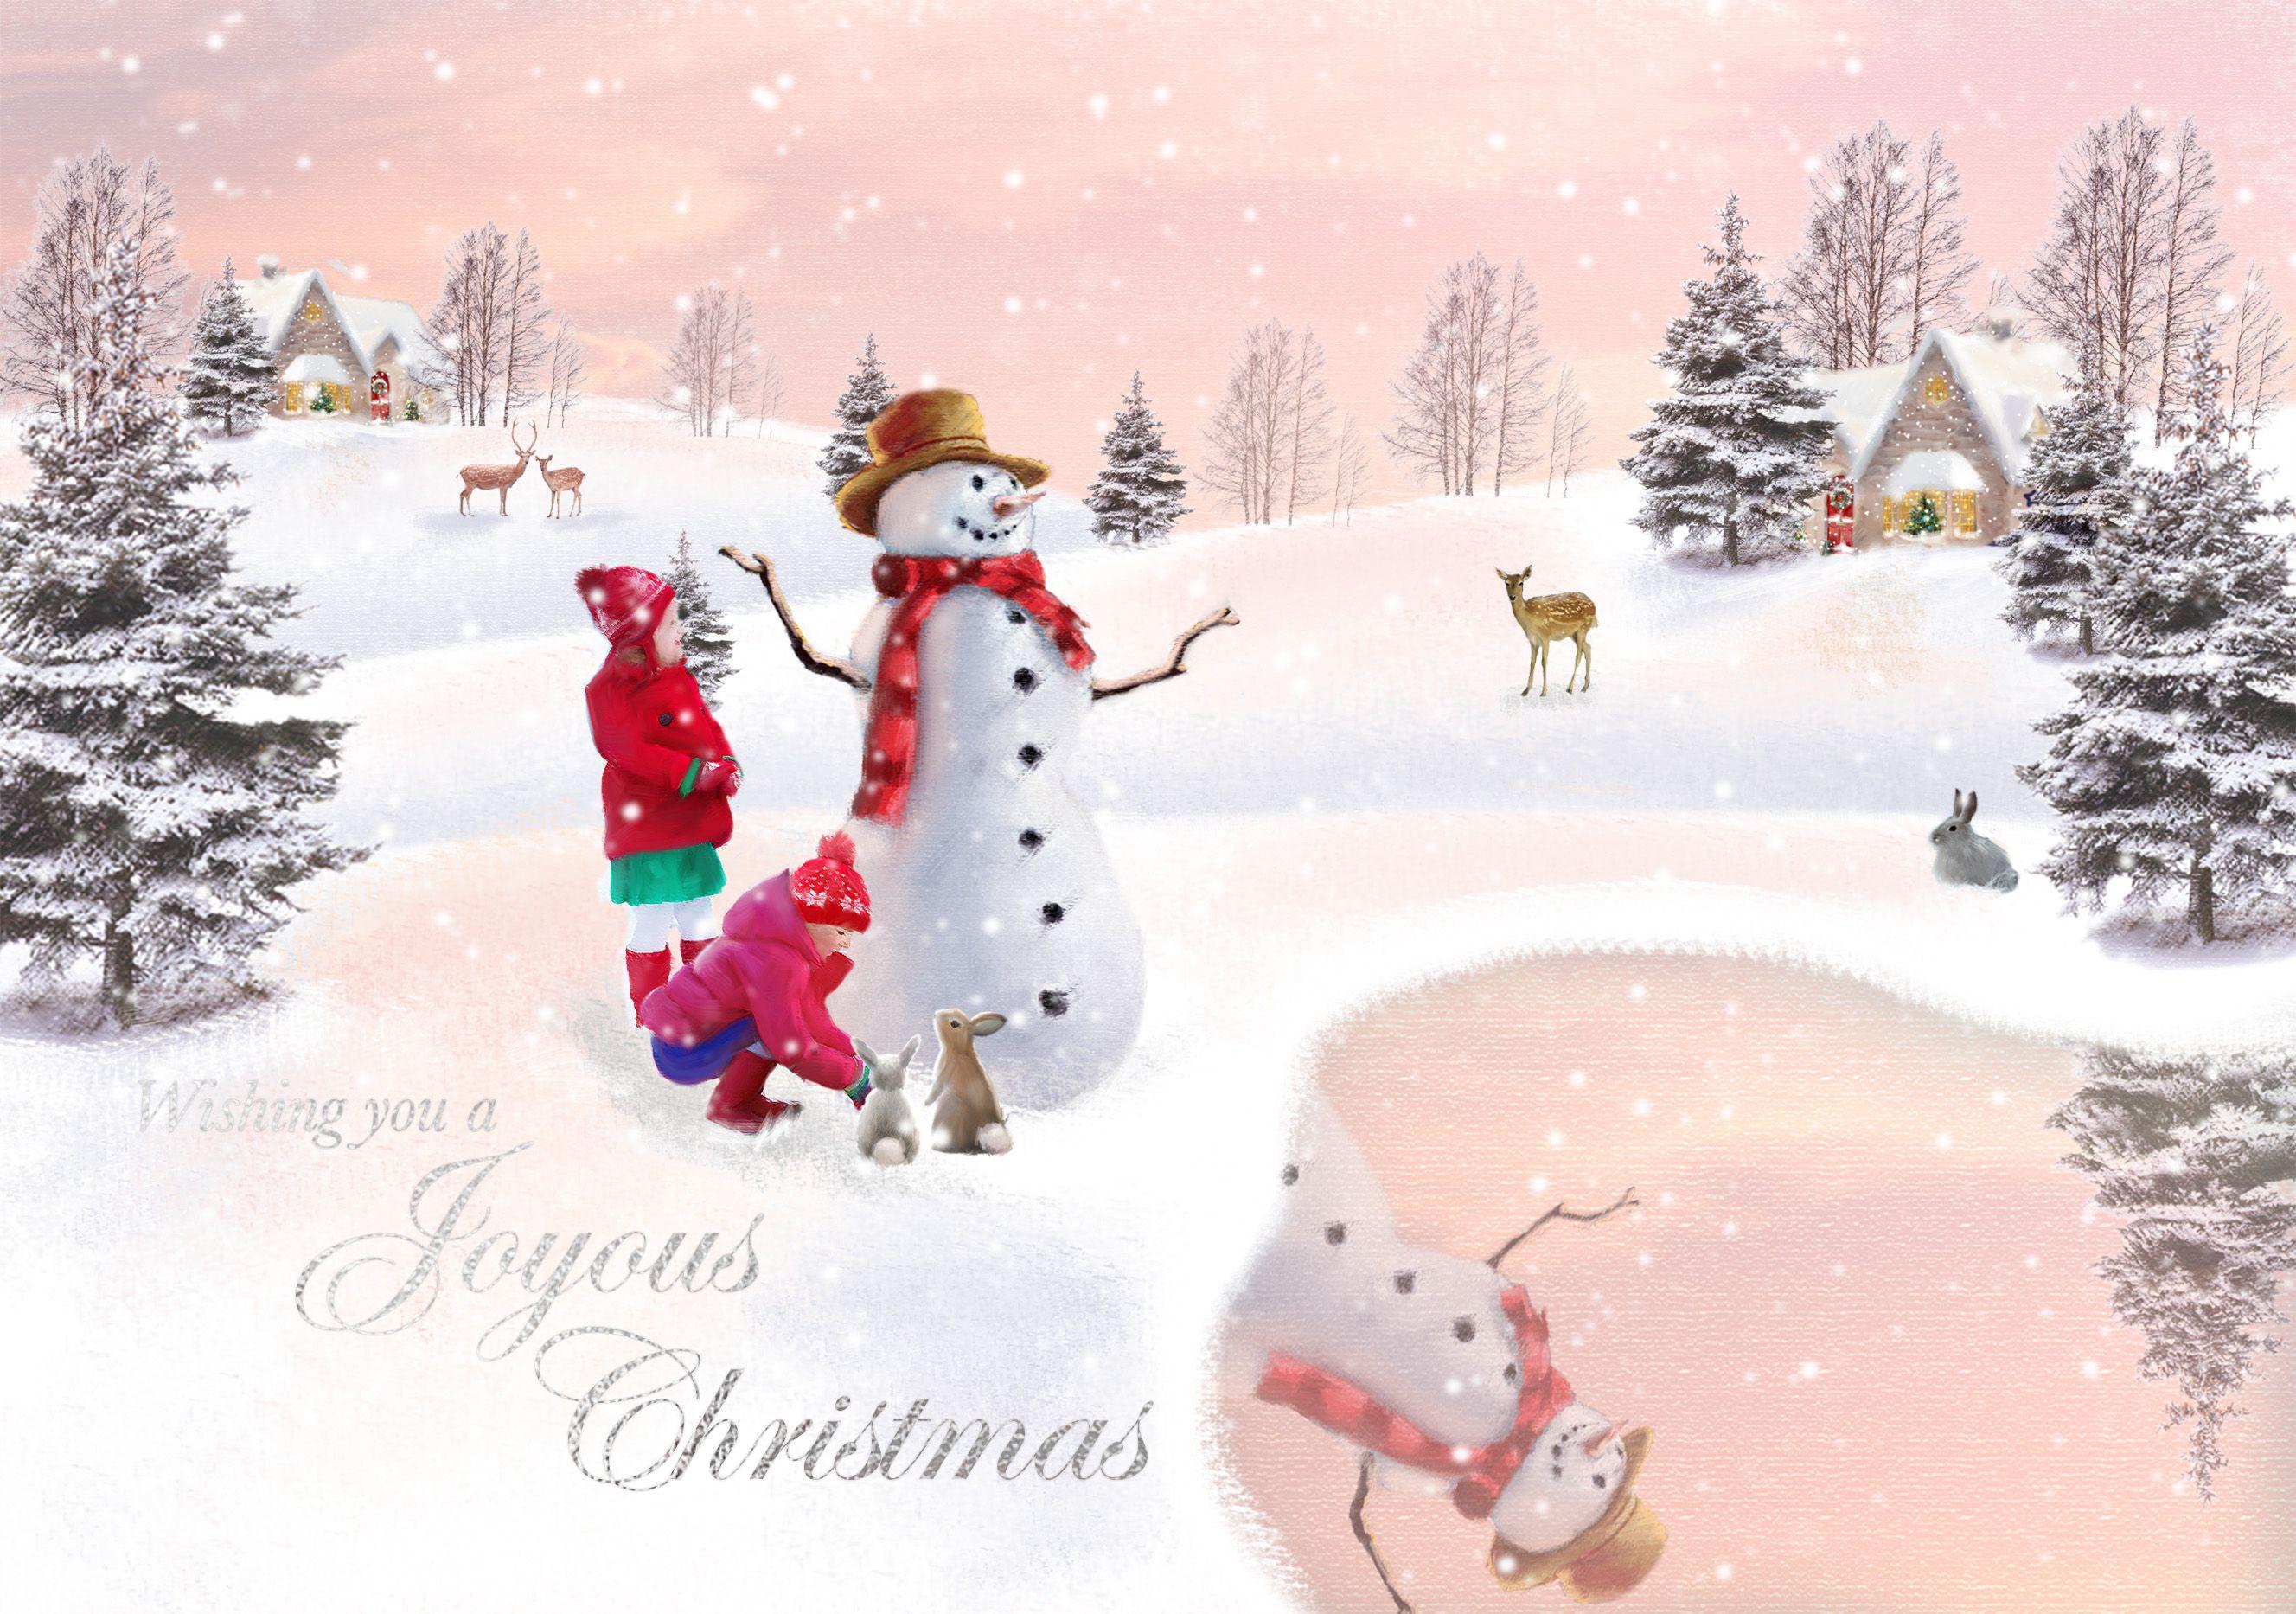 Snowman Lake Charity Christmas Card Traditional